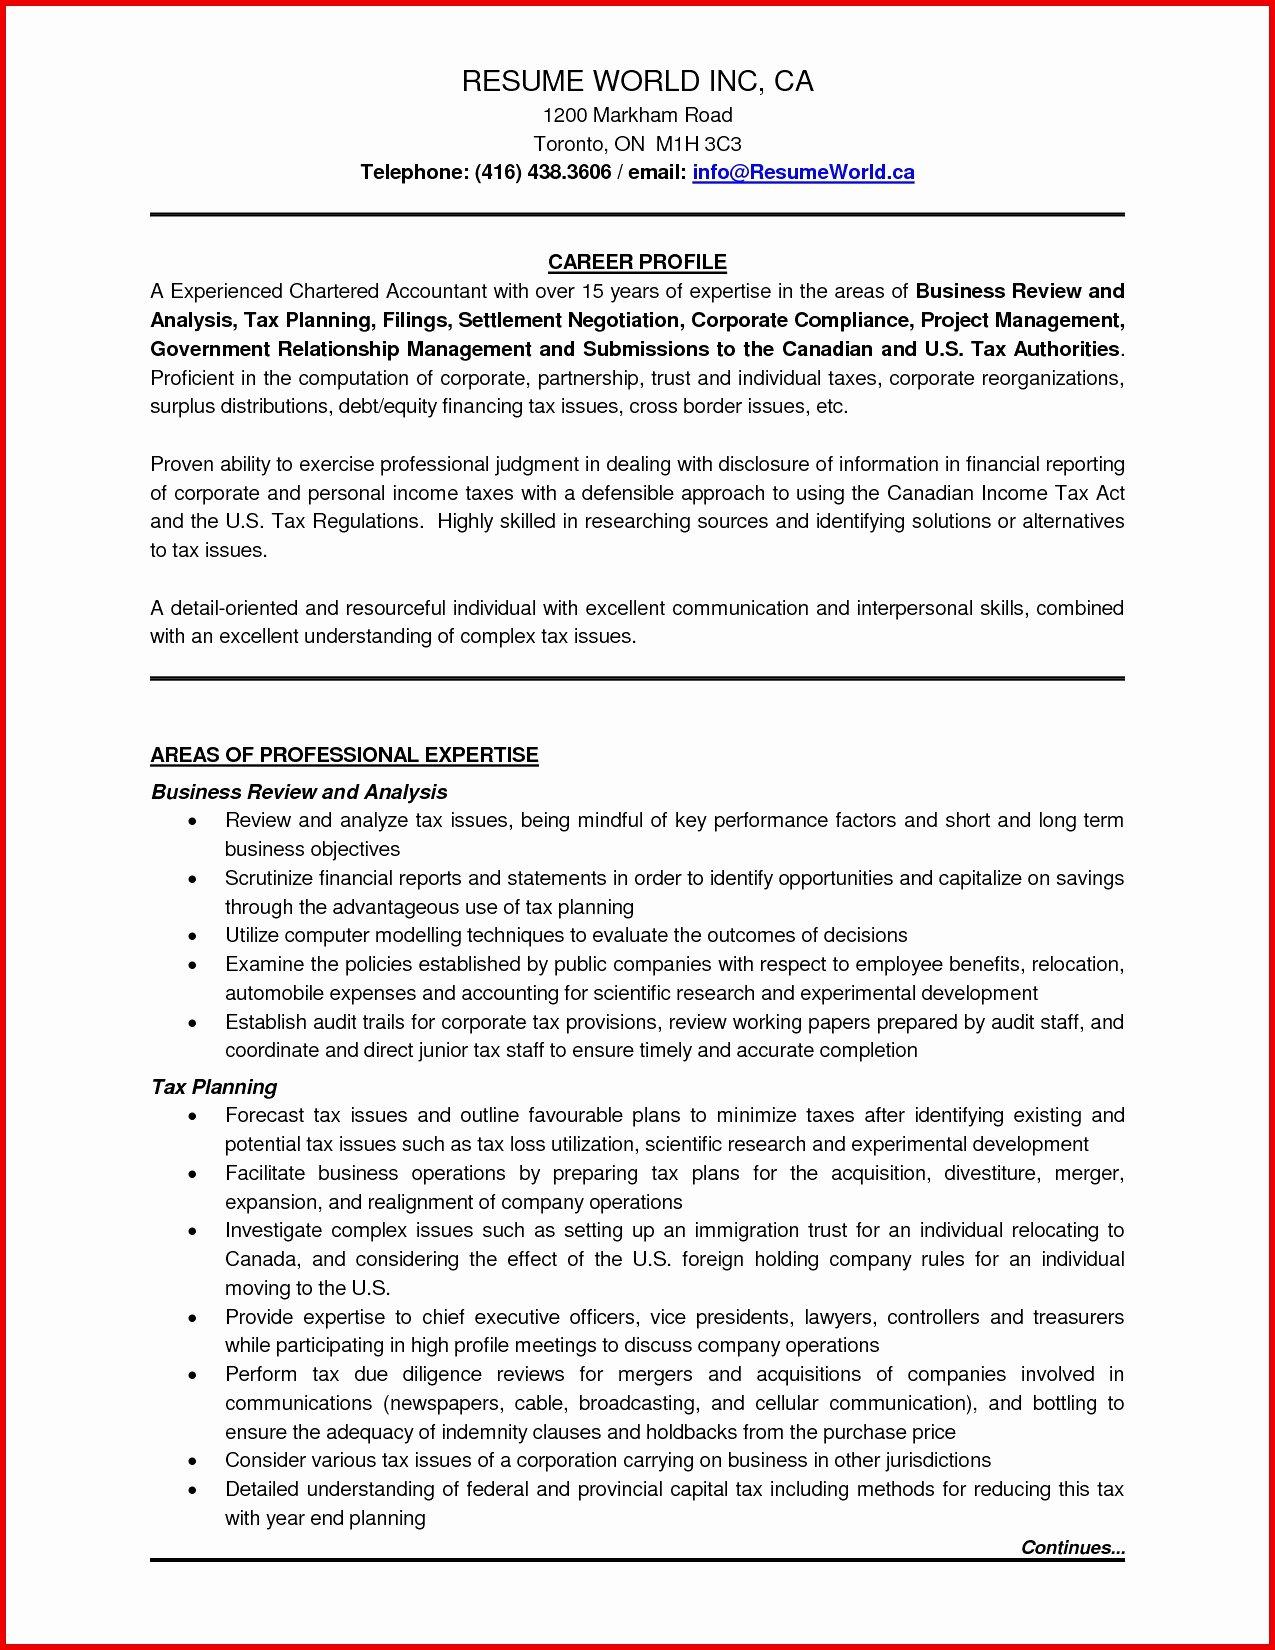 Department Reorganization Plan Template Best Of Restructuring Proposal Template – Pewna Apteka